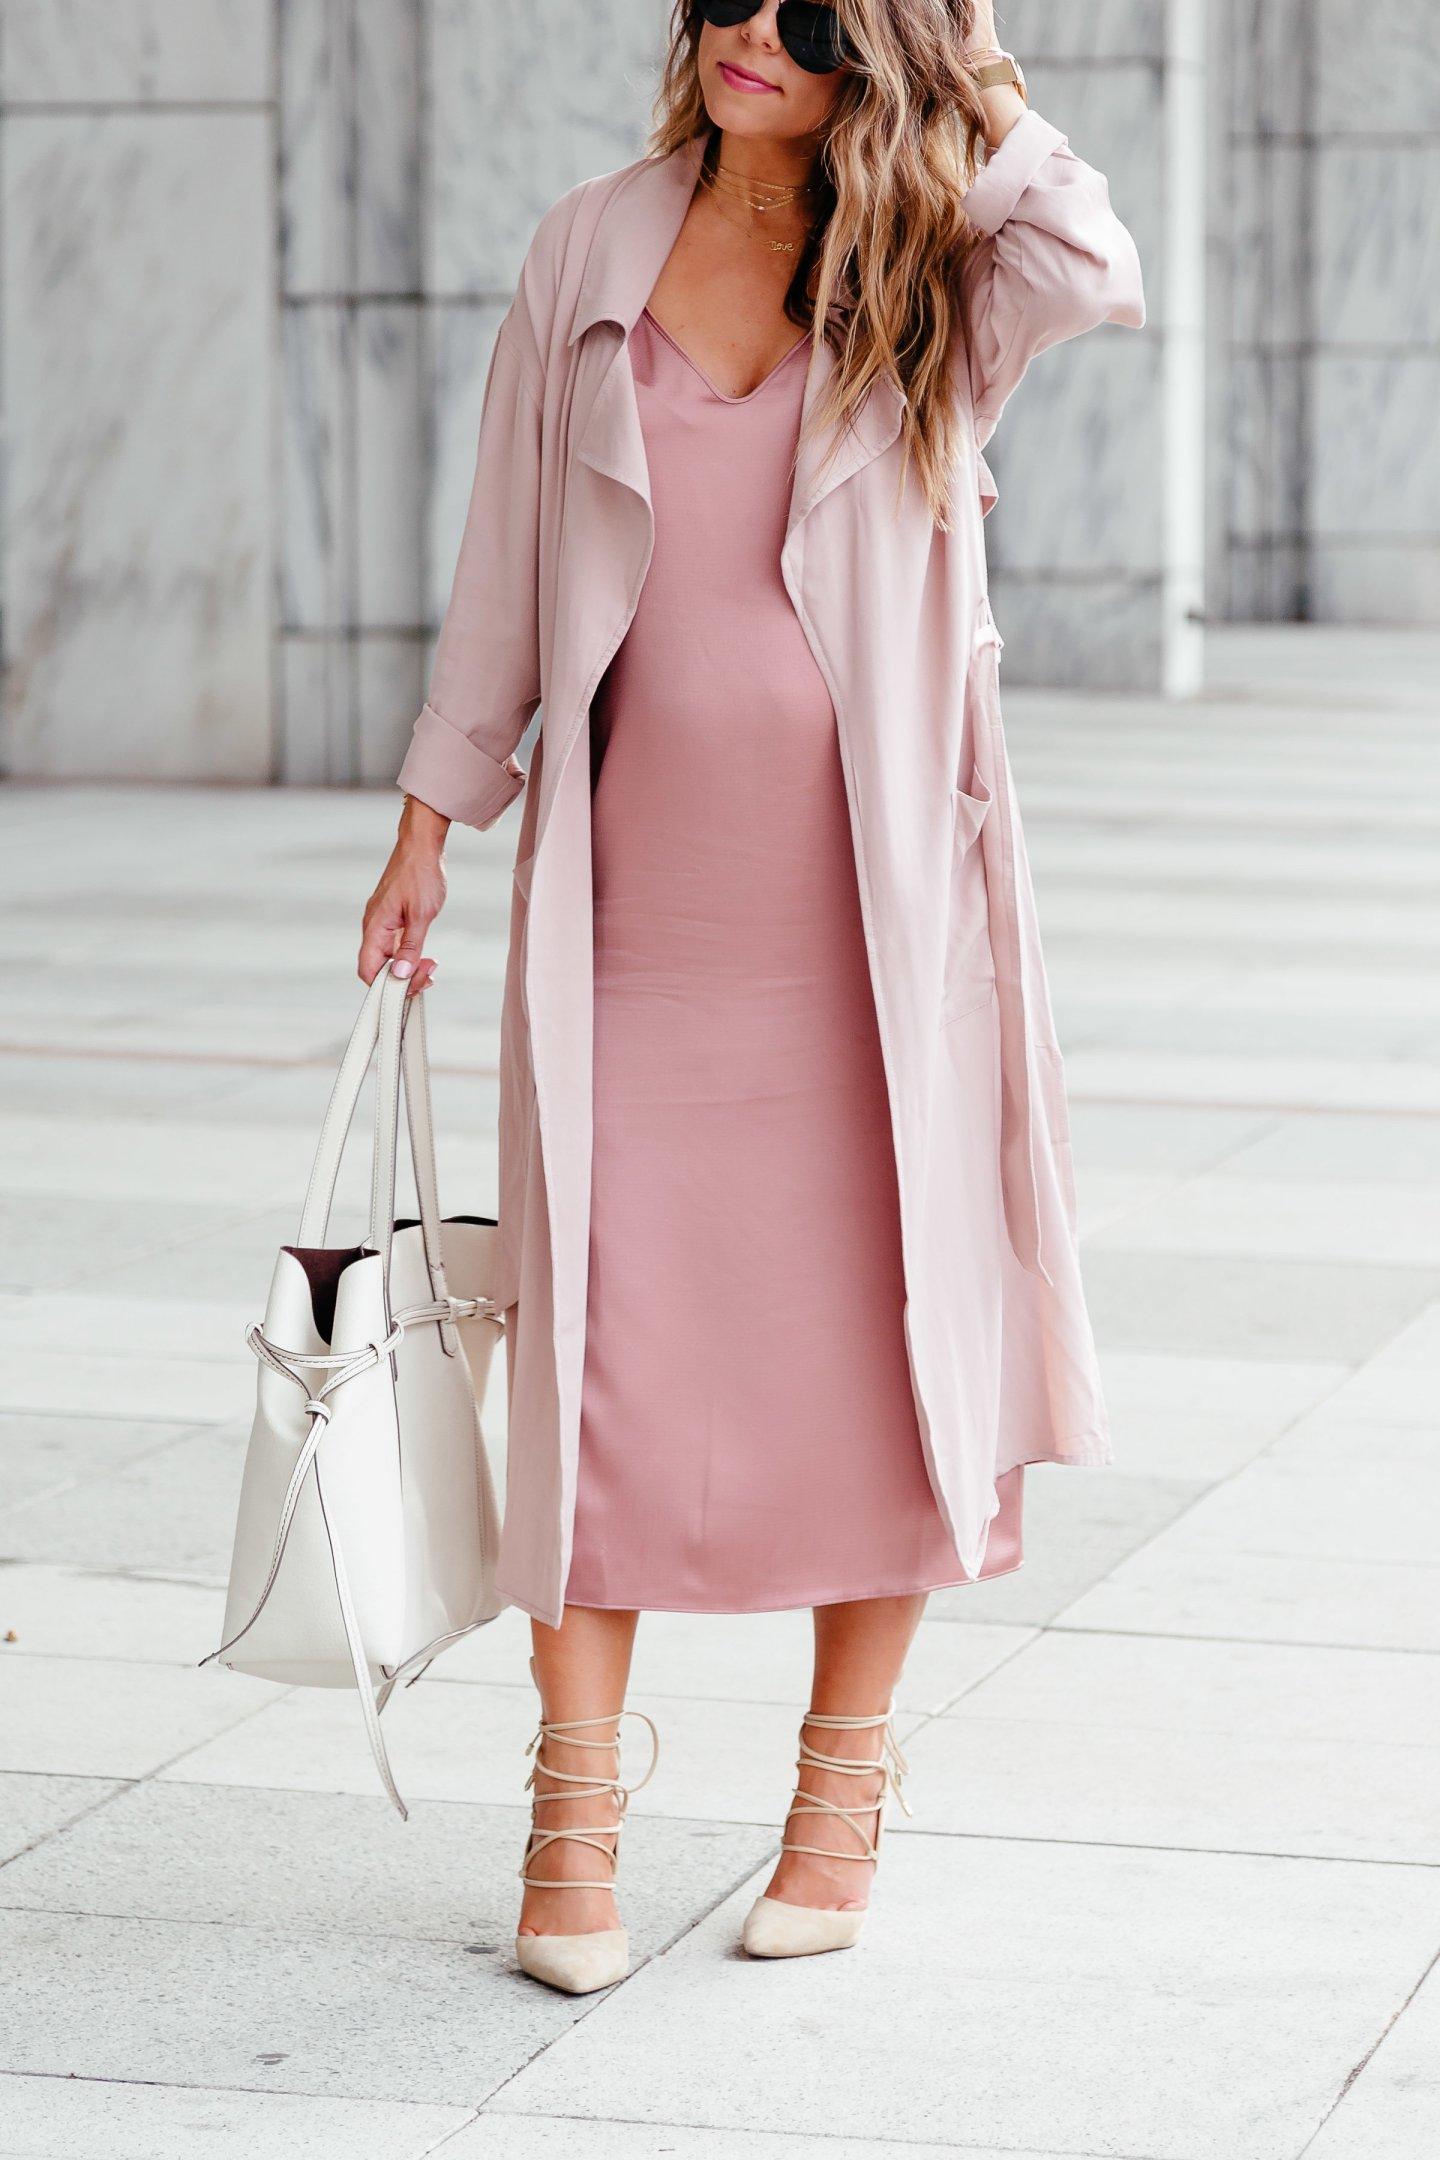 blush slip dress with trench coat